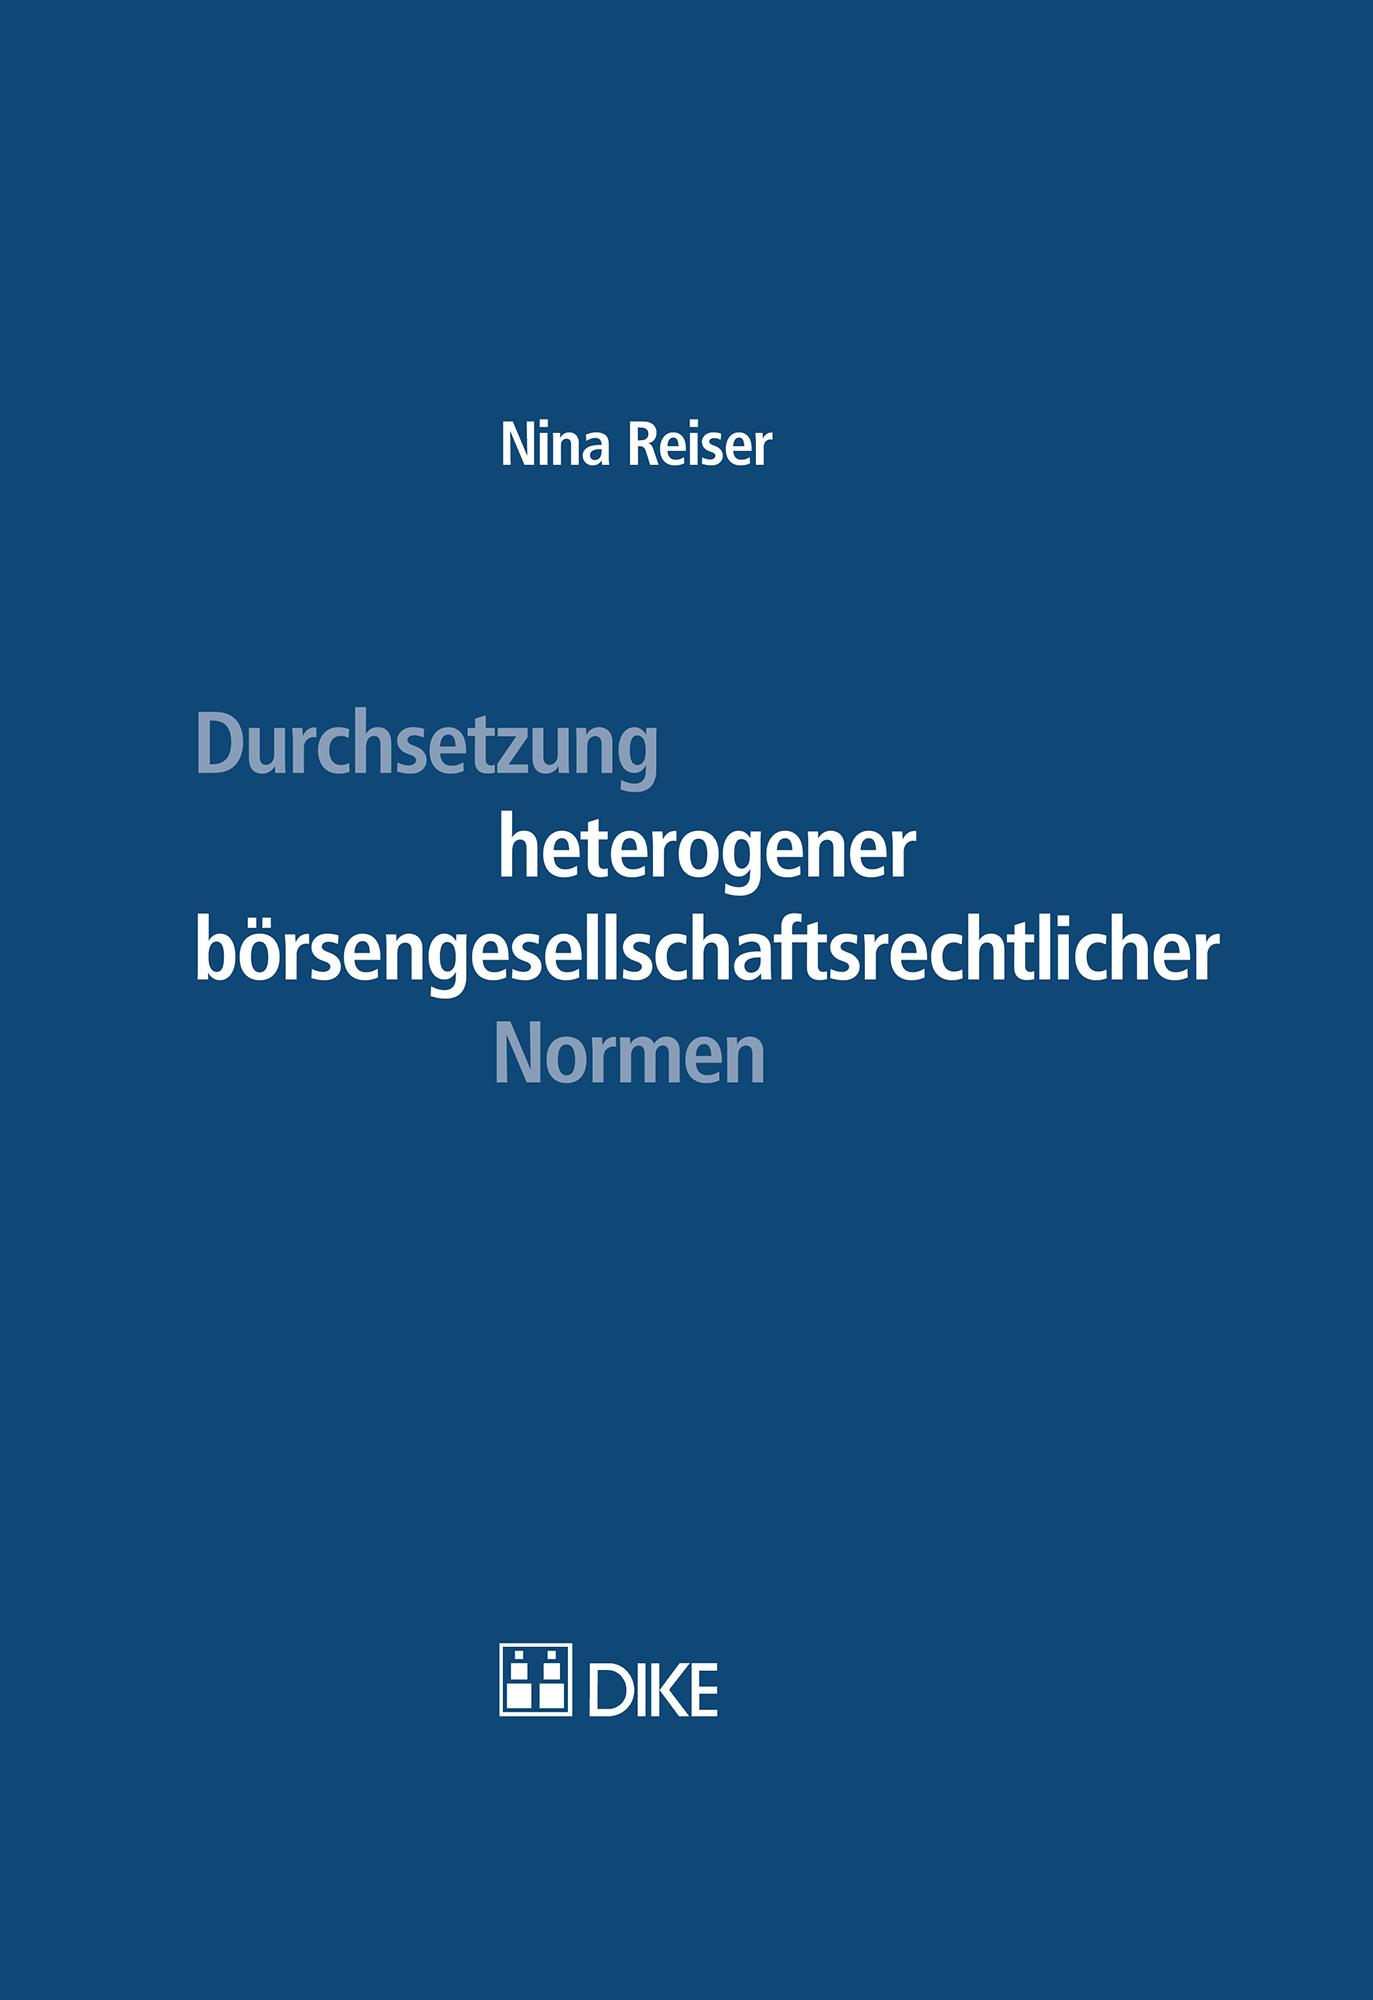 Durchsetzung heterogener börsengesellschaftsrechtlicher Normen